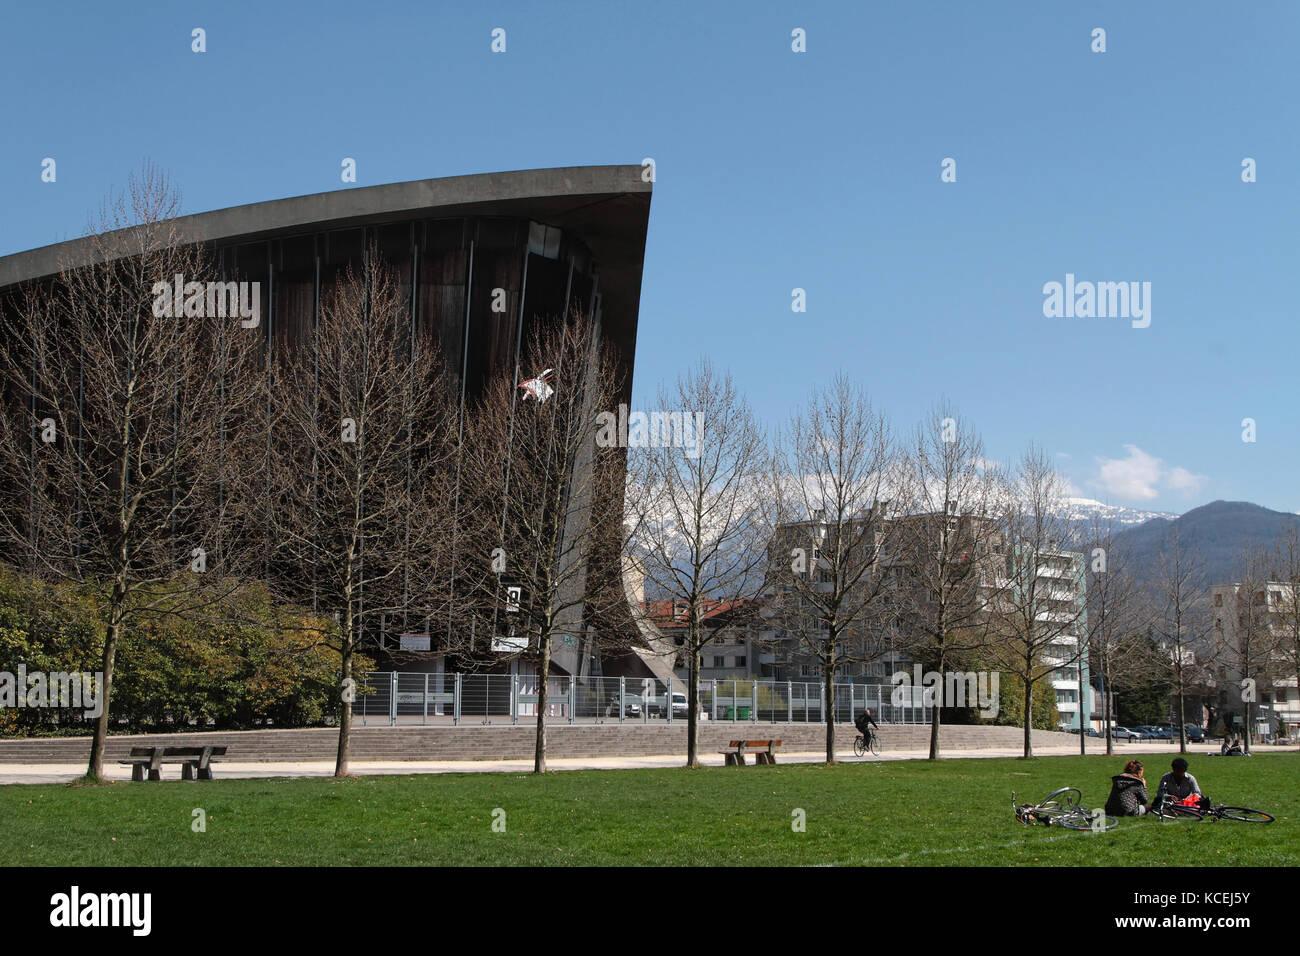 Architecture In Grenoble Stock Photos & Architecture In Grenoble ...